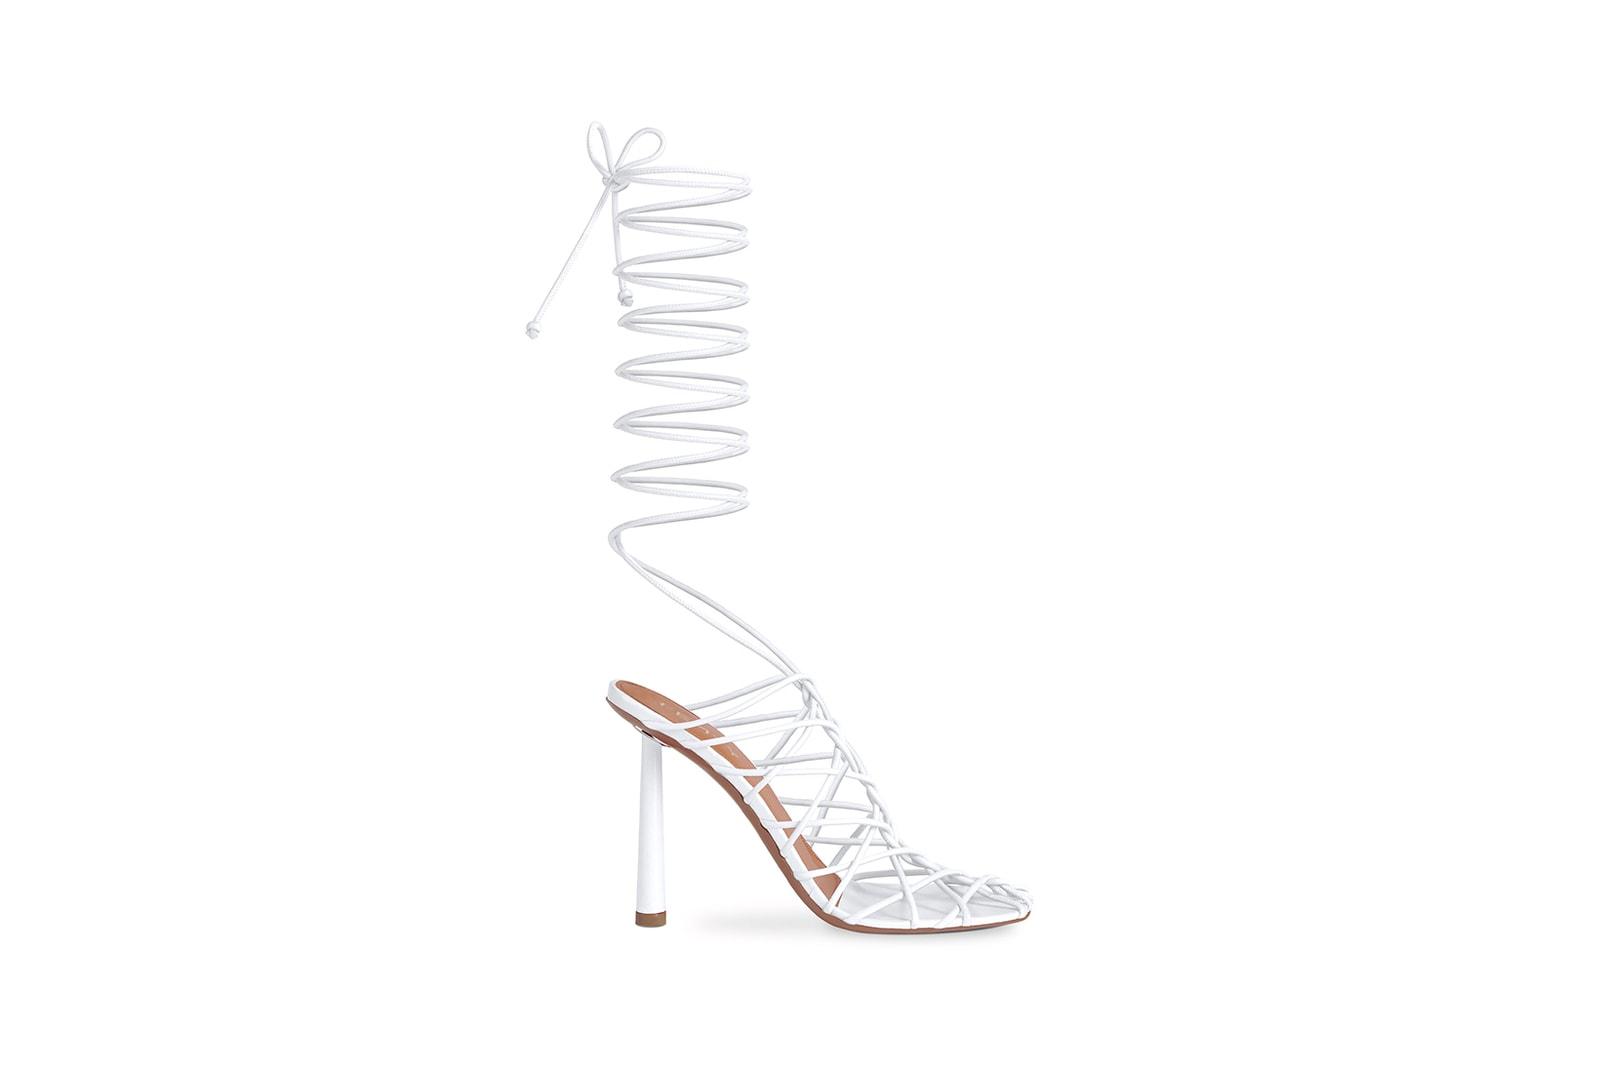 Rihanna Amina Muaddi FENTY Shoe Collaboration 7-20 Collection